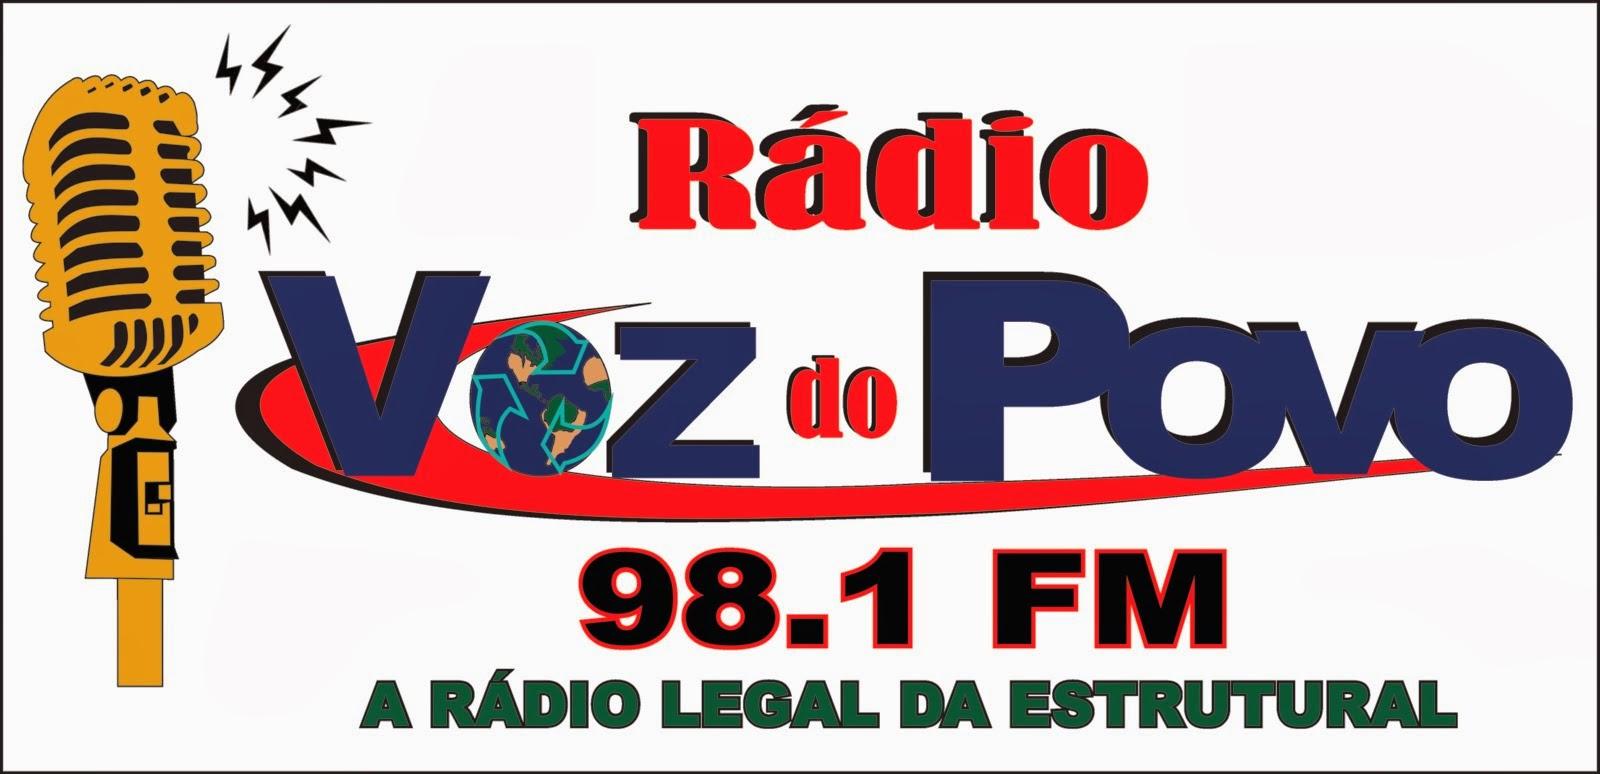 Radio voz do povo